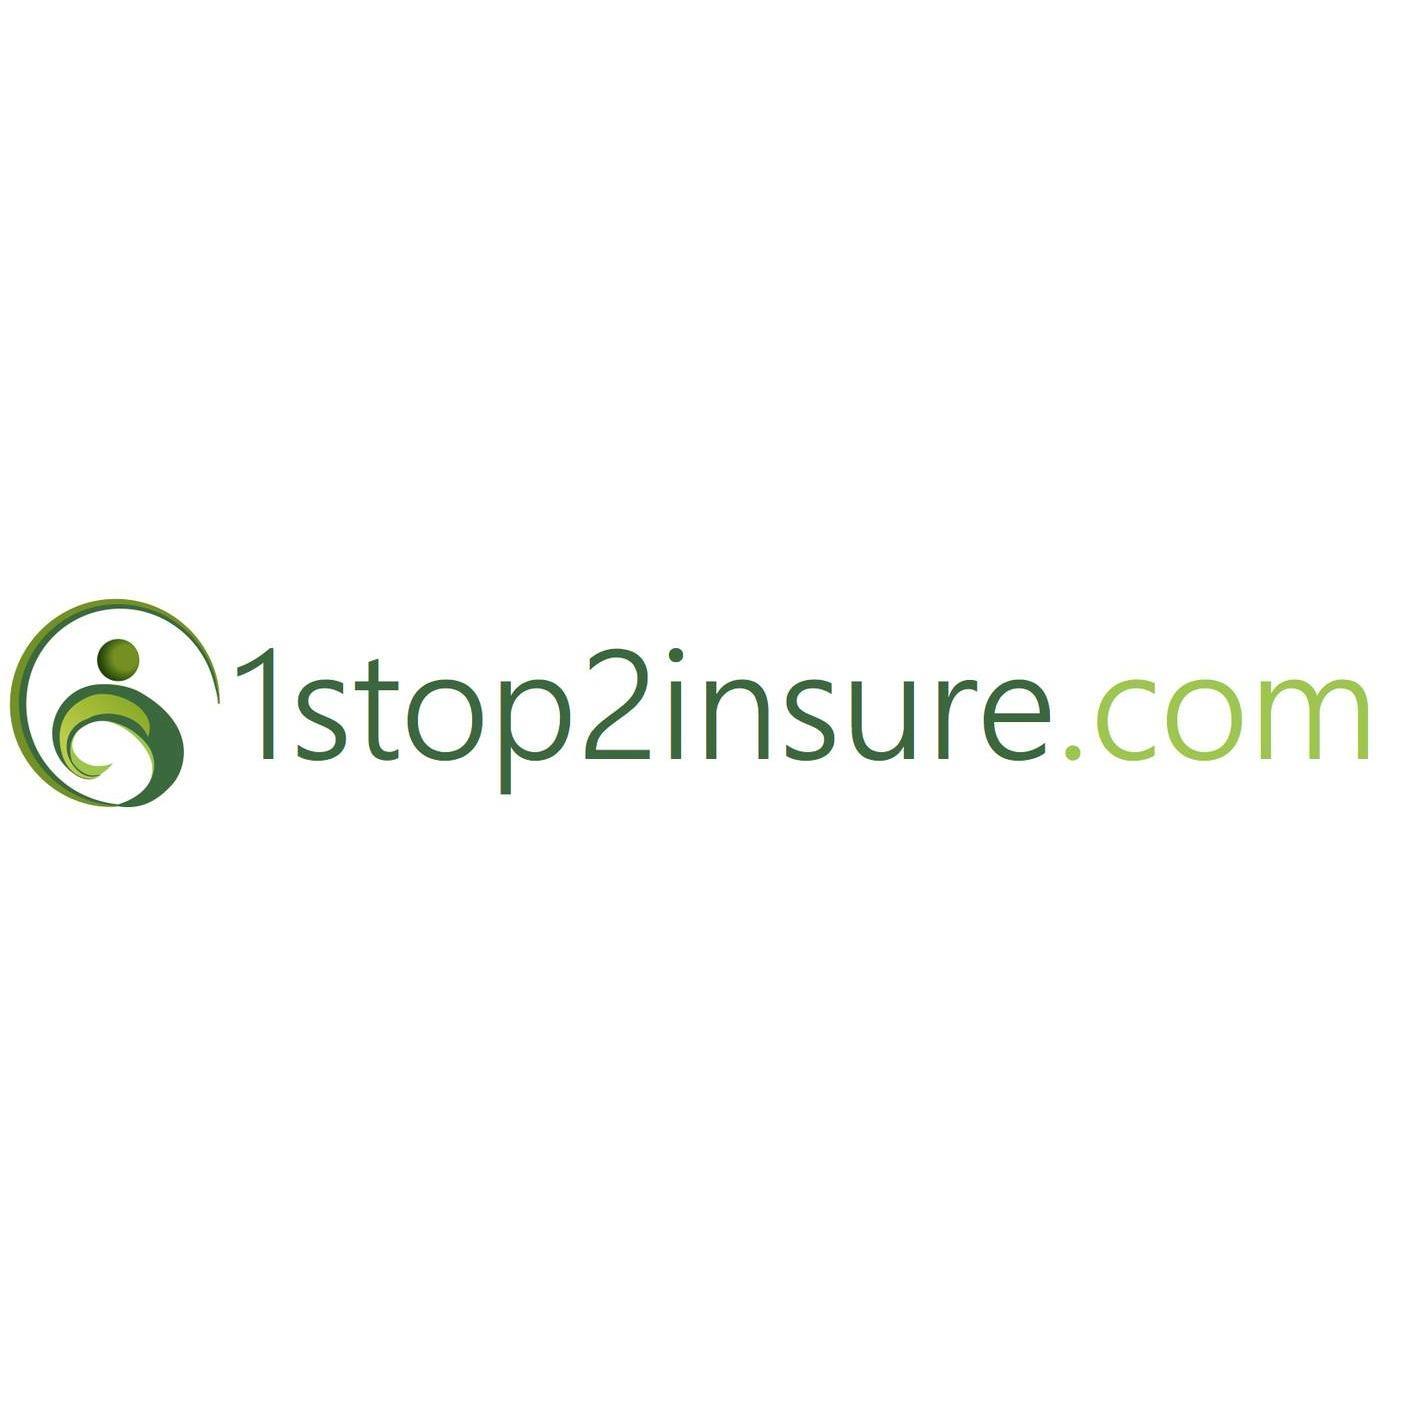 1stop2insure - Healthcare Solutions Team Logo